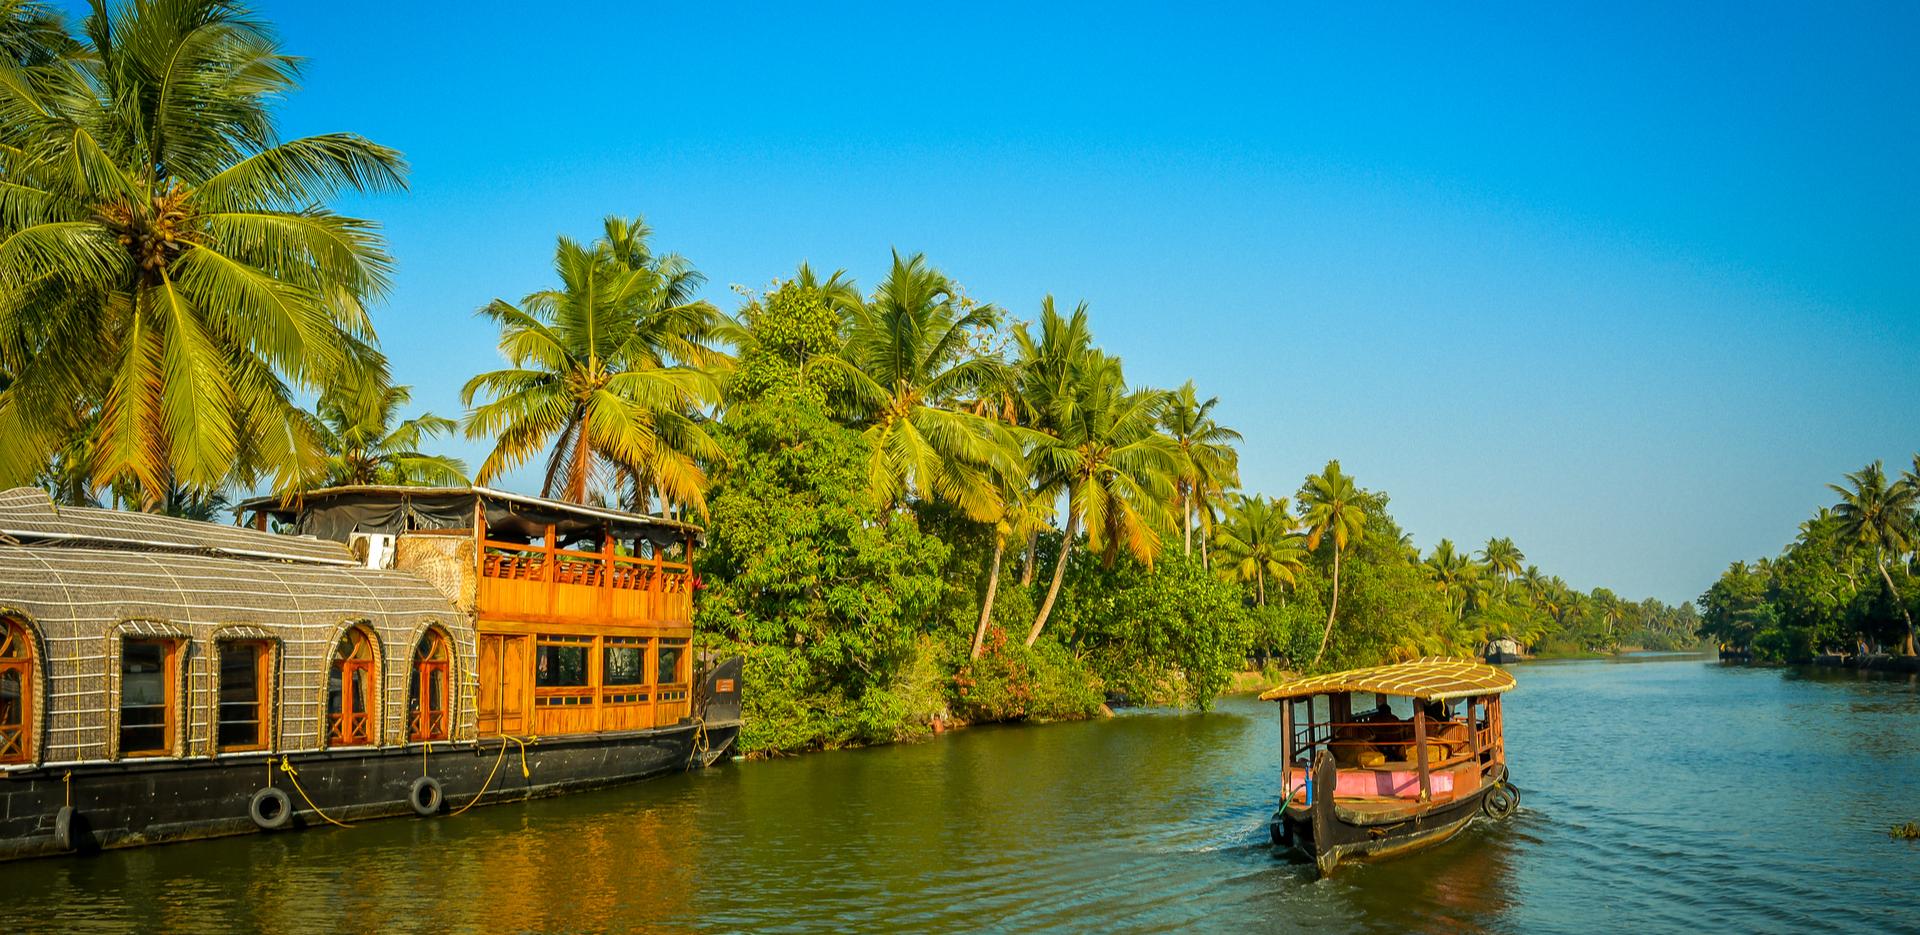 Houseboat on the backwater of Kerala